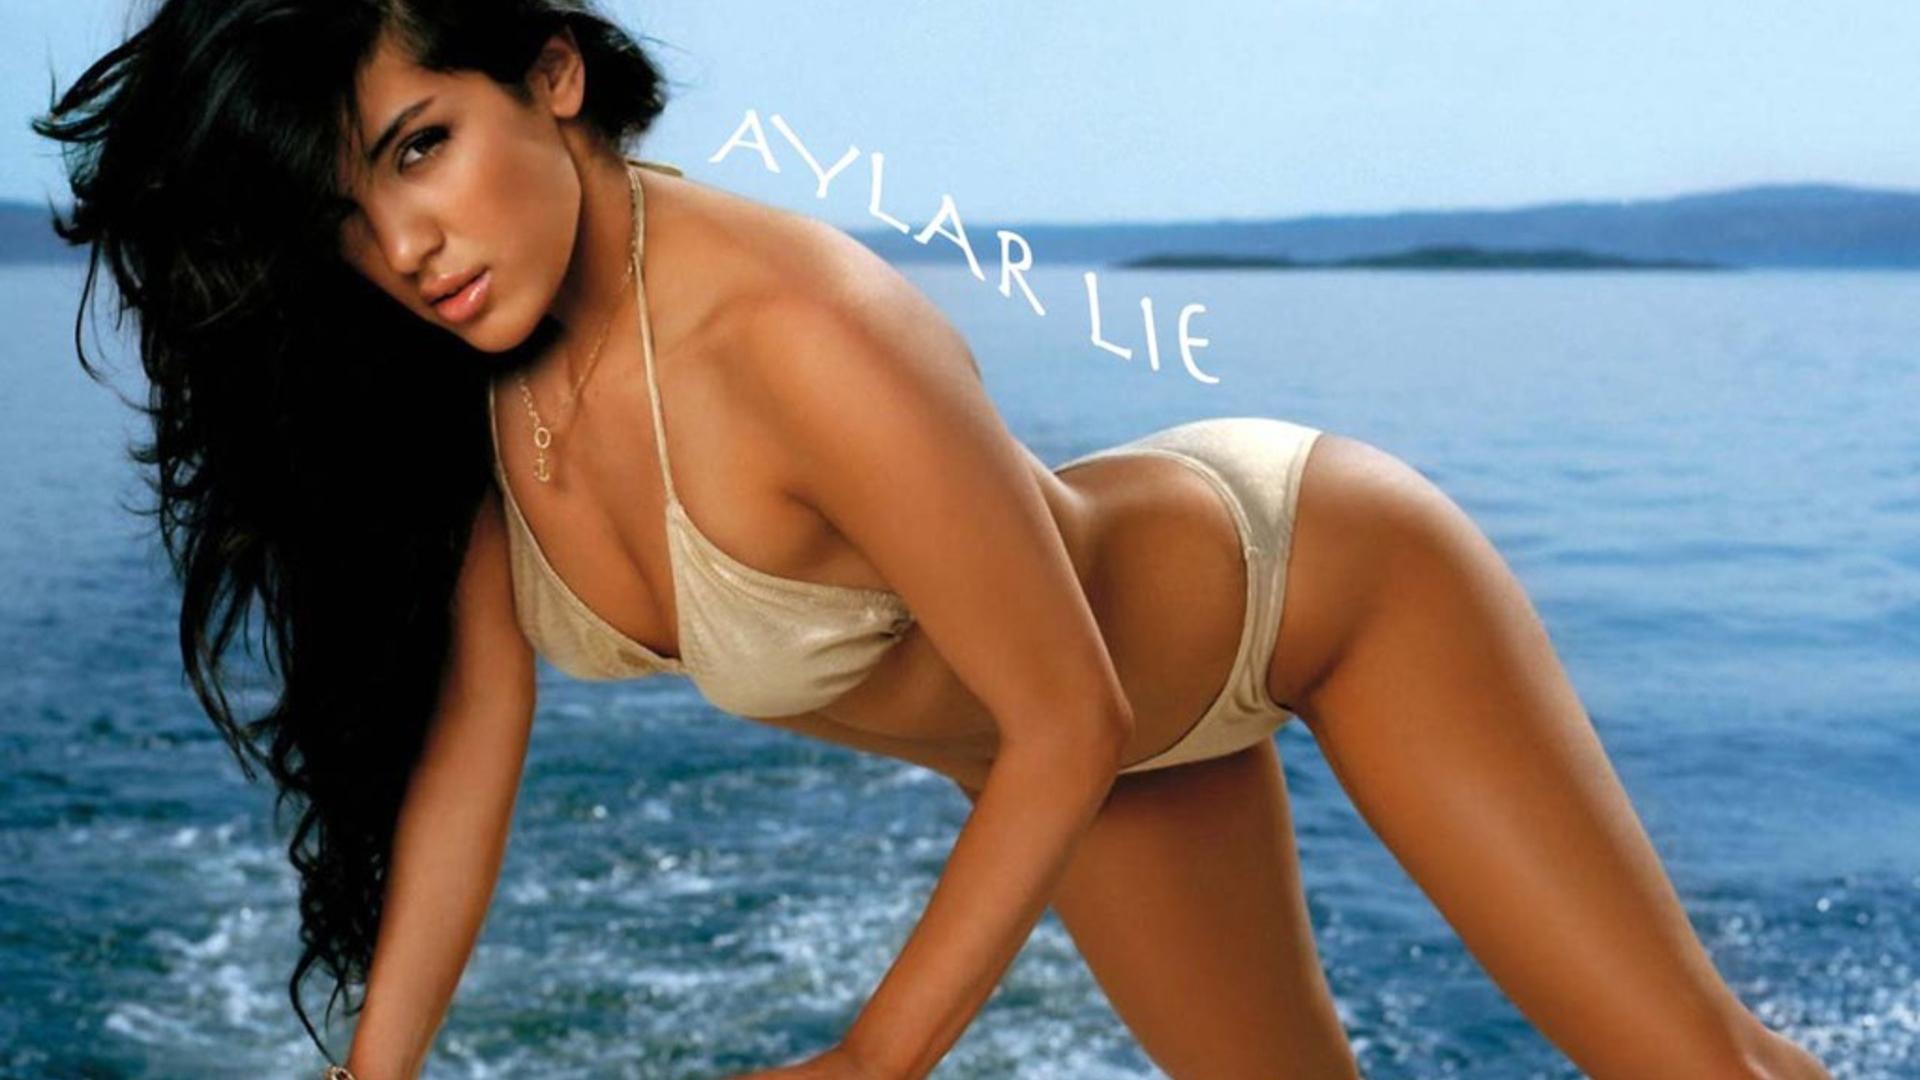 Aylar Lie Pictures